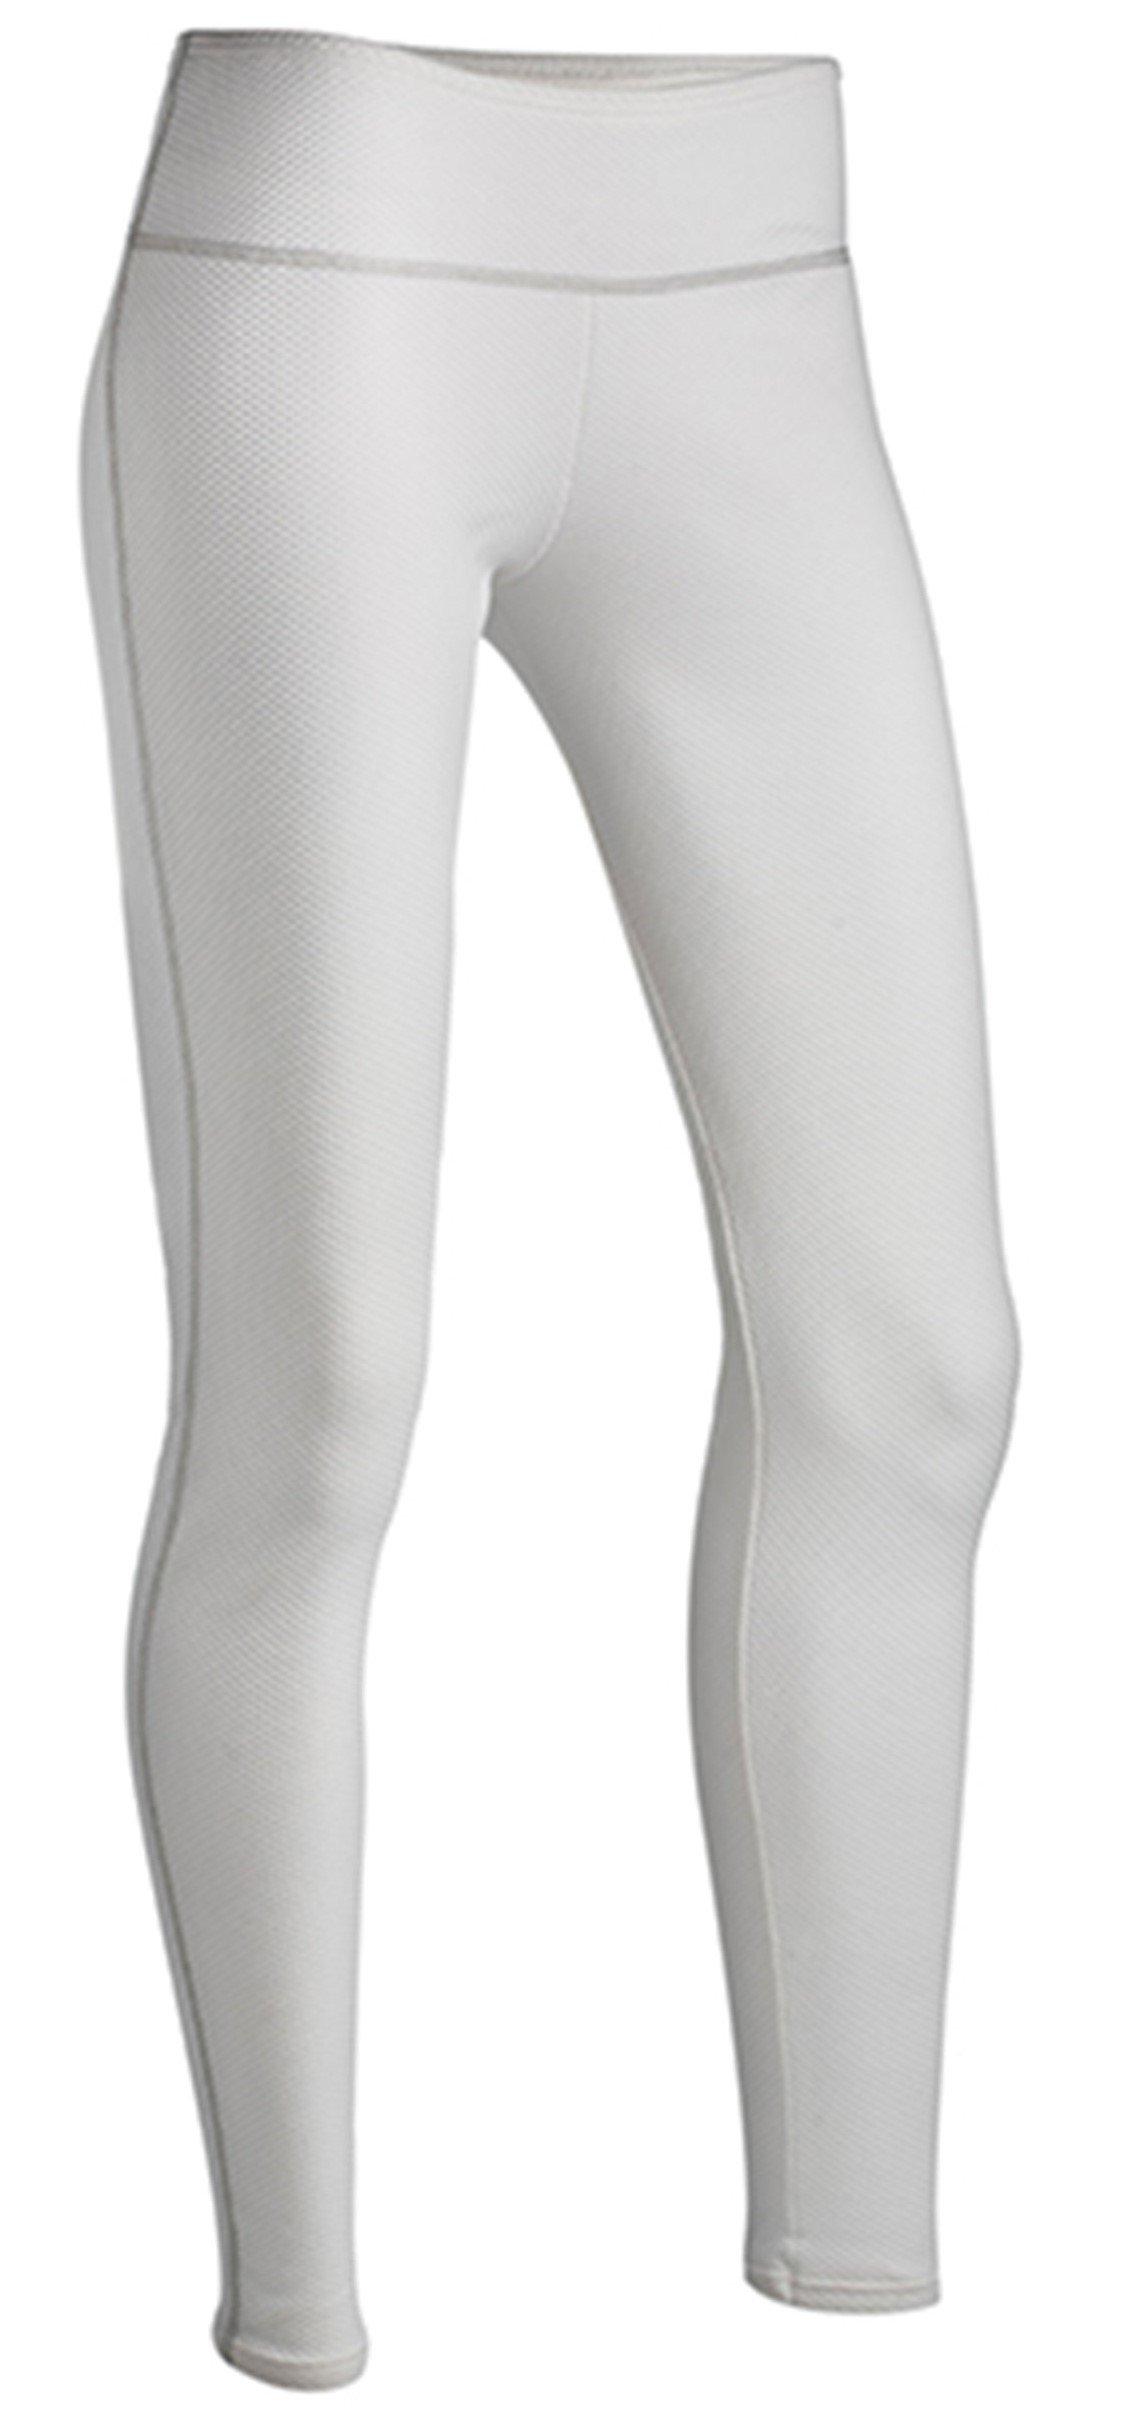 ColdPruf Women's Honeycomb Base Layer Leggings, White, Medium